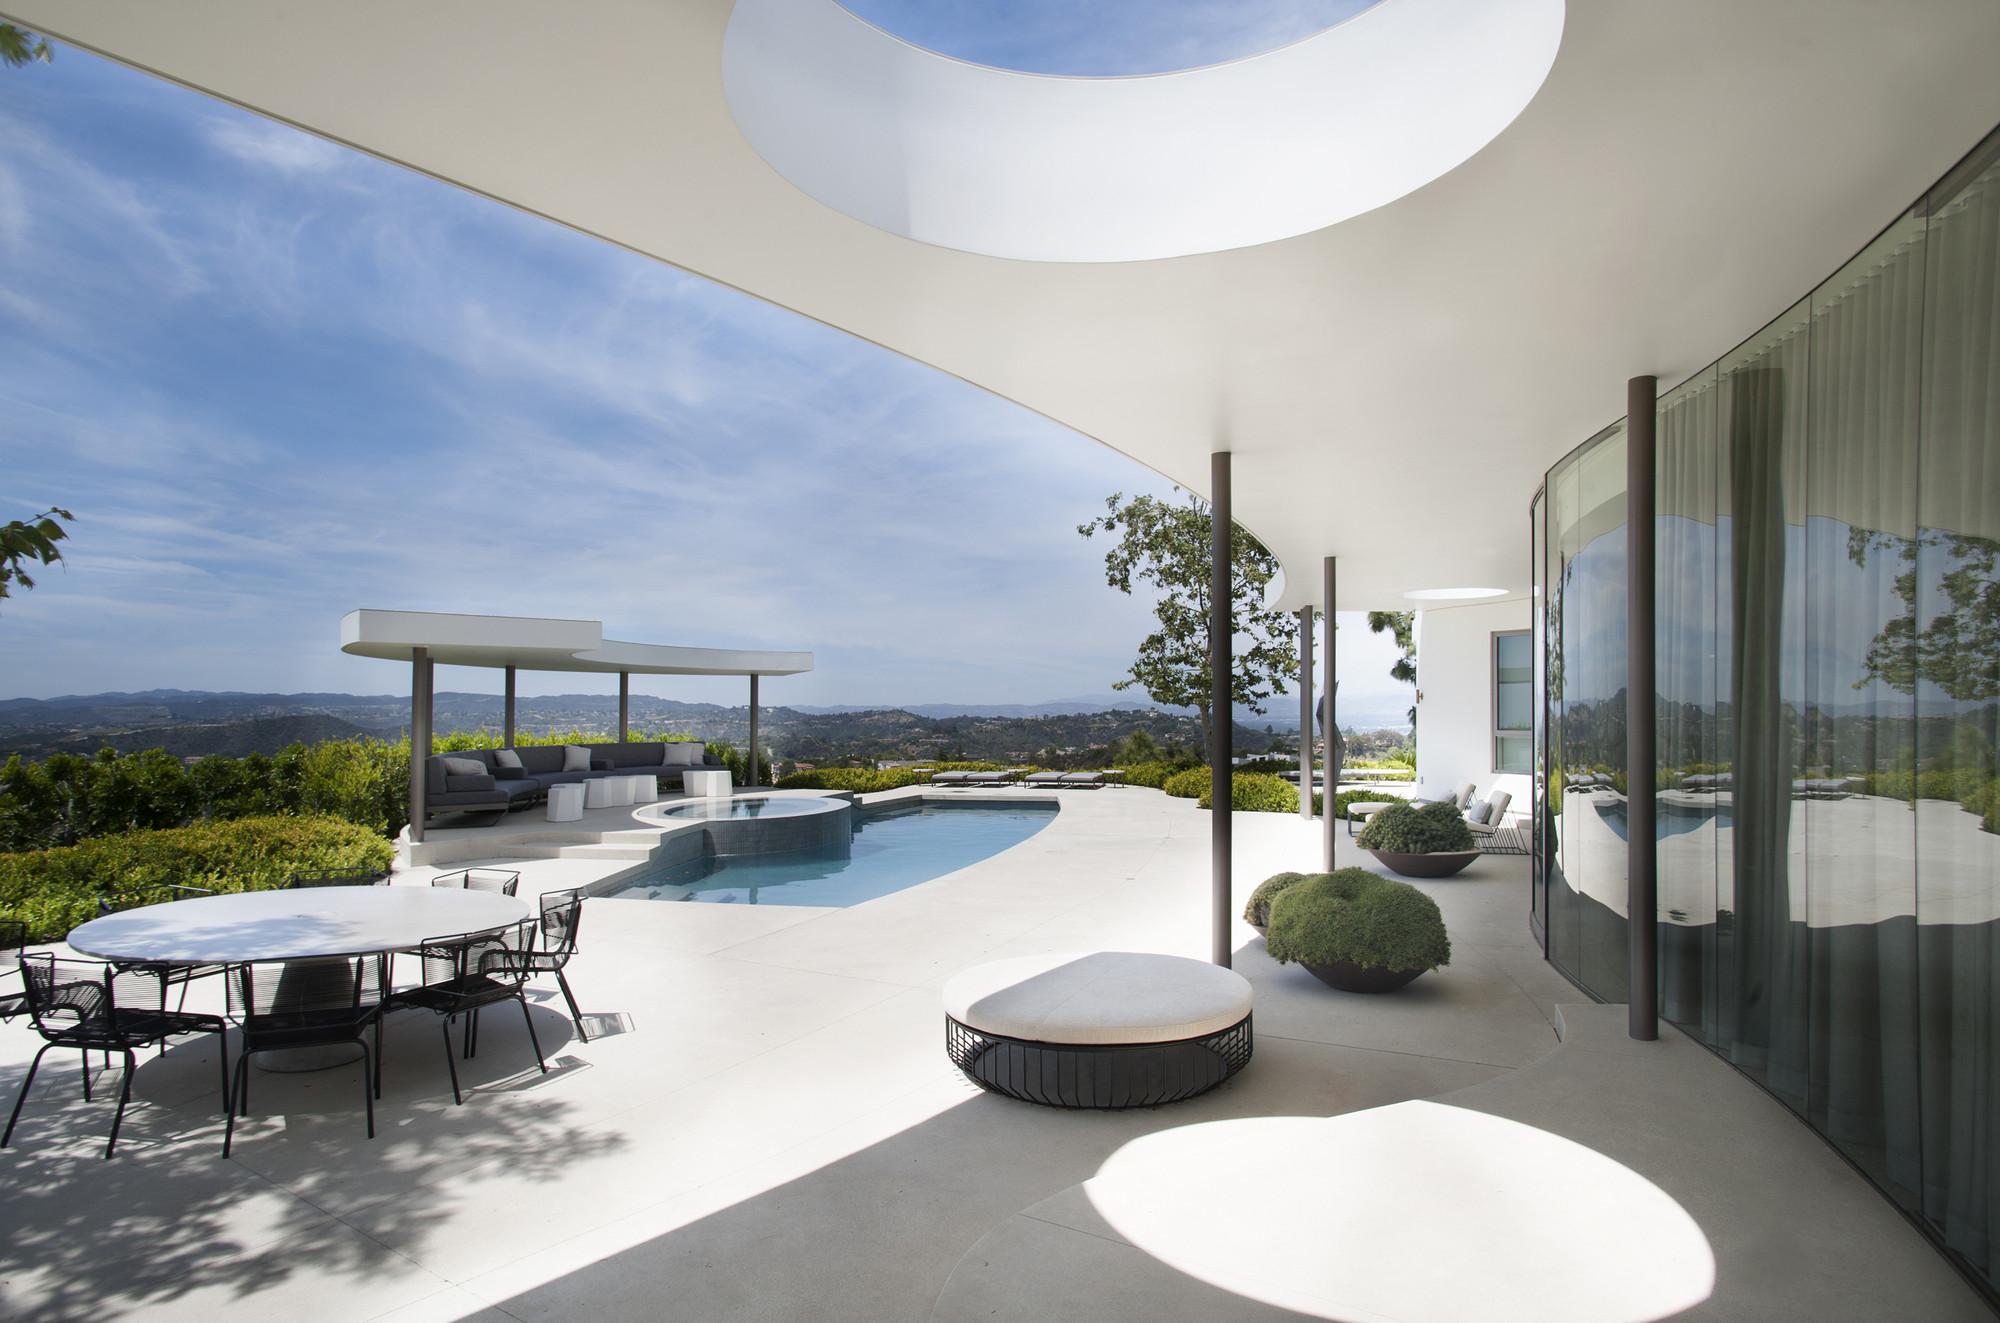 Trousdale Estates Contemporary Home / Dennis Gibbens Architects, Courtesy of Dennis Gibbens Architects